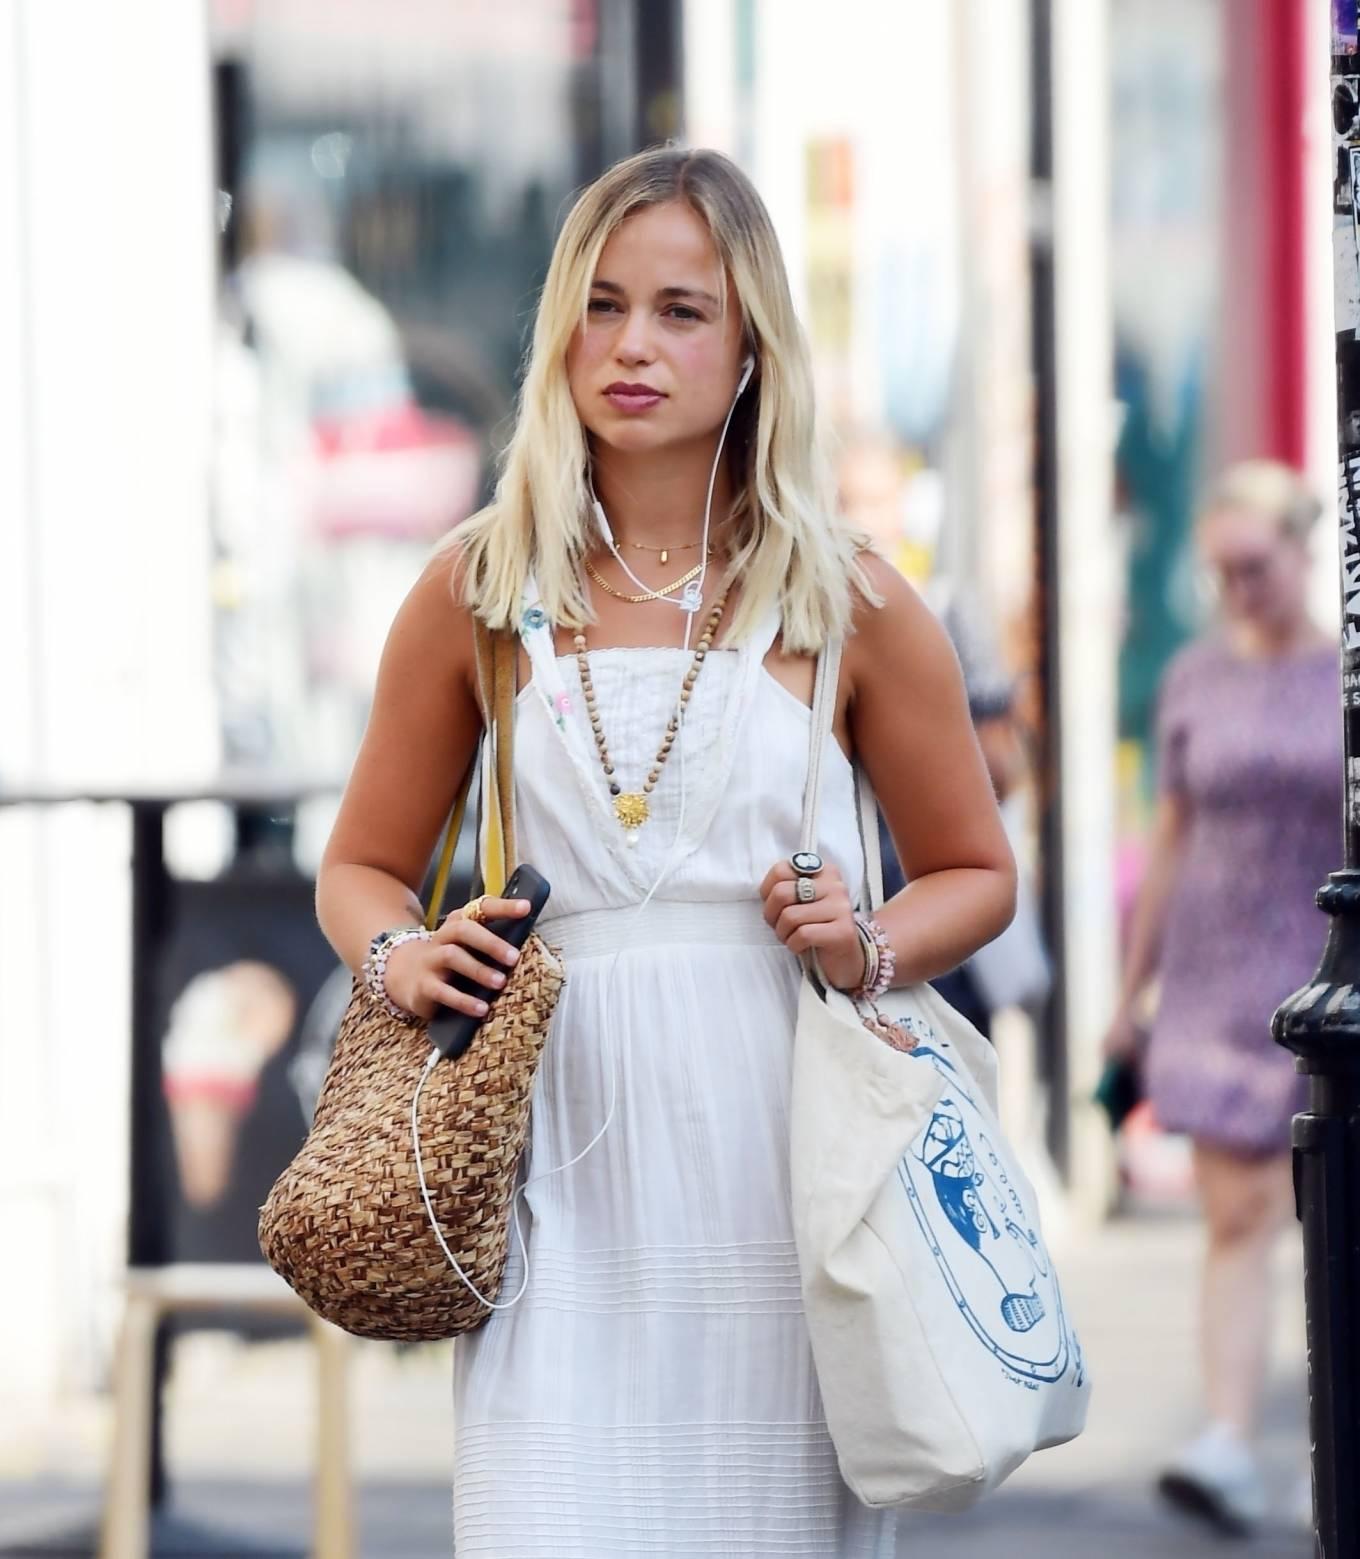 Amelia Windsor 2020 : Amelia Windsor – Looks stunning in a white summery dress in London-06